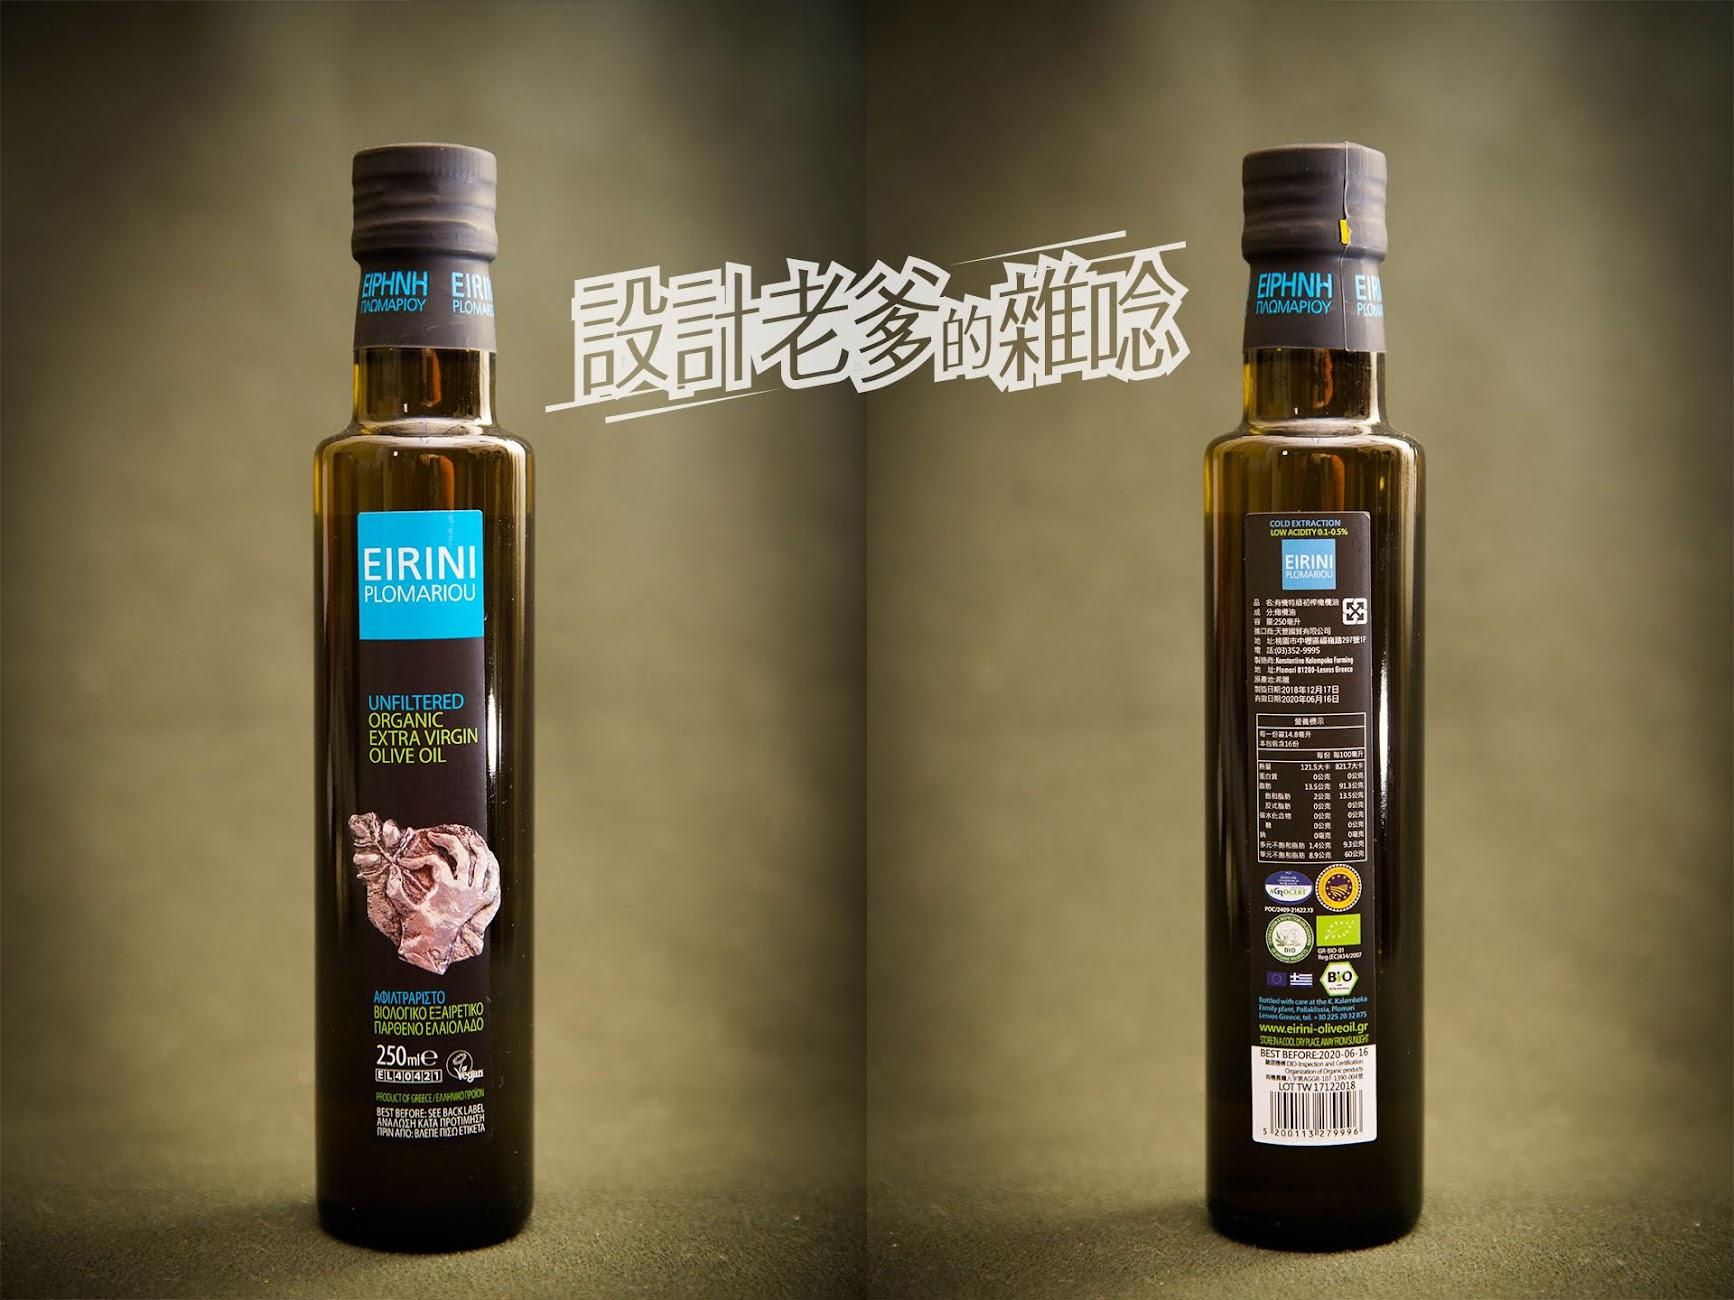 Eirini Plomariou-愛琴海火山島搭飛機來的未過濾有機特級初榨金牌橄欖油